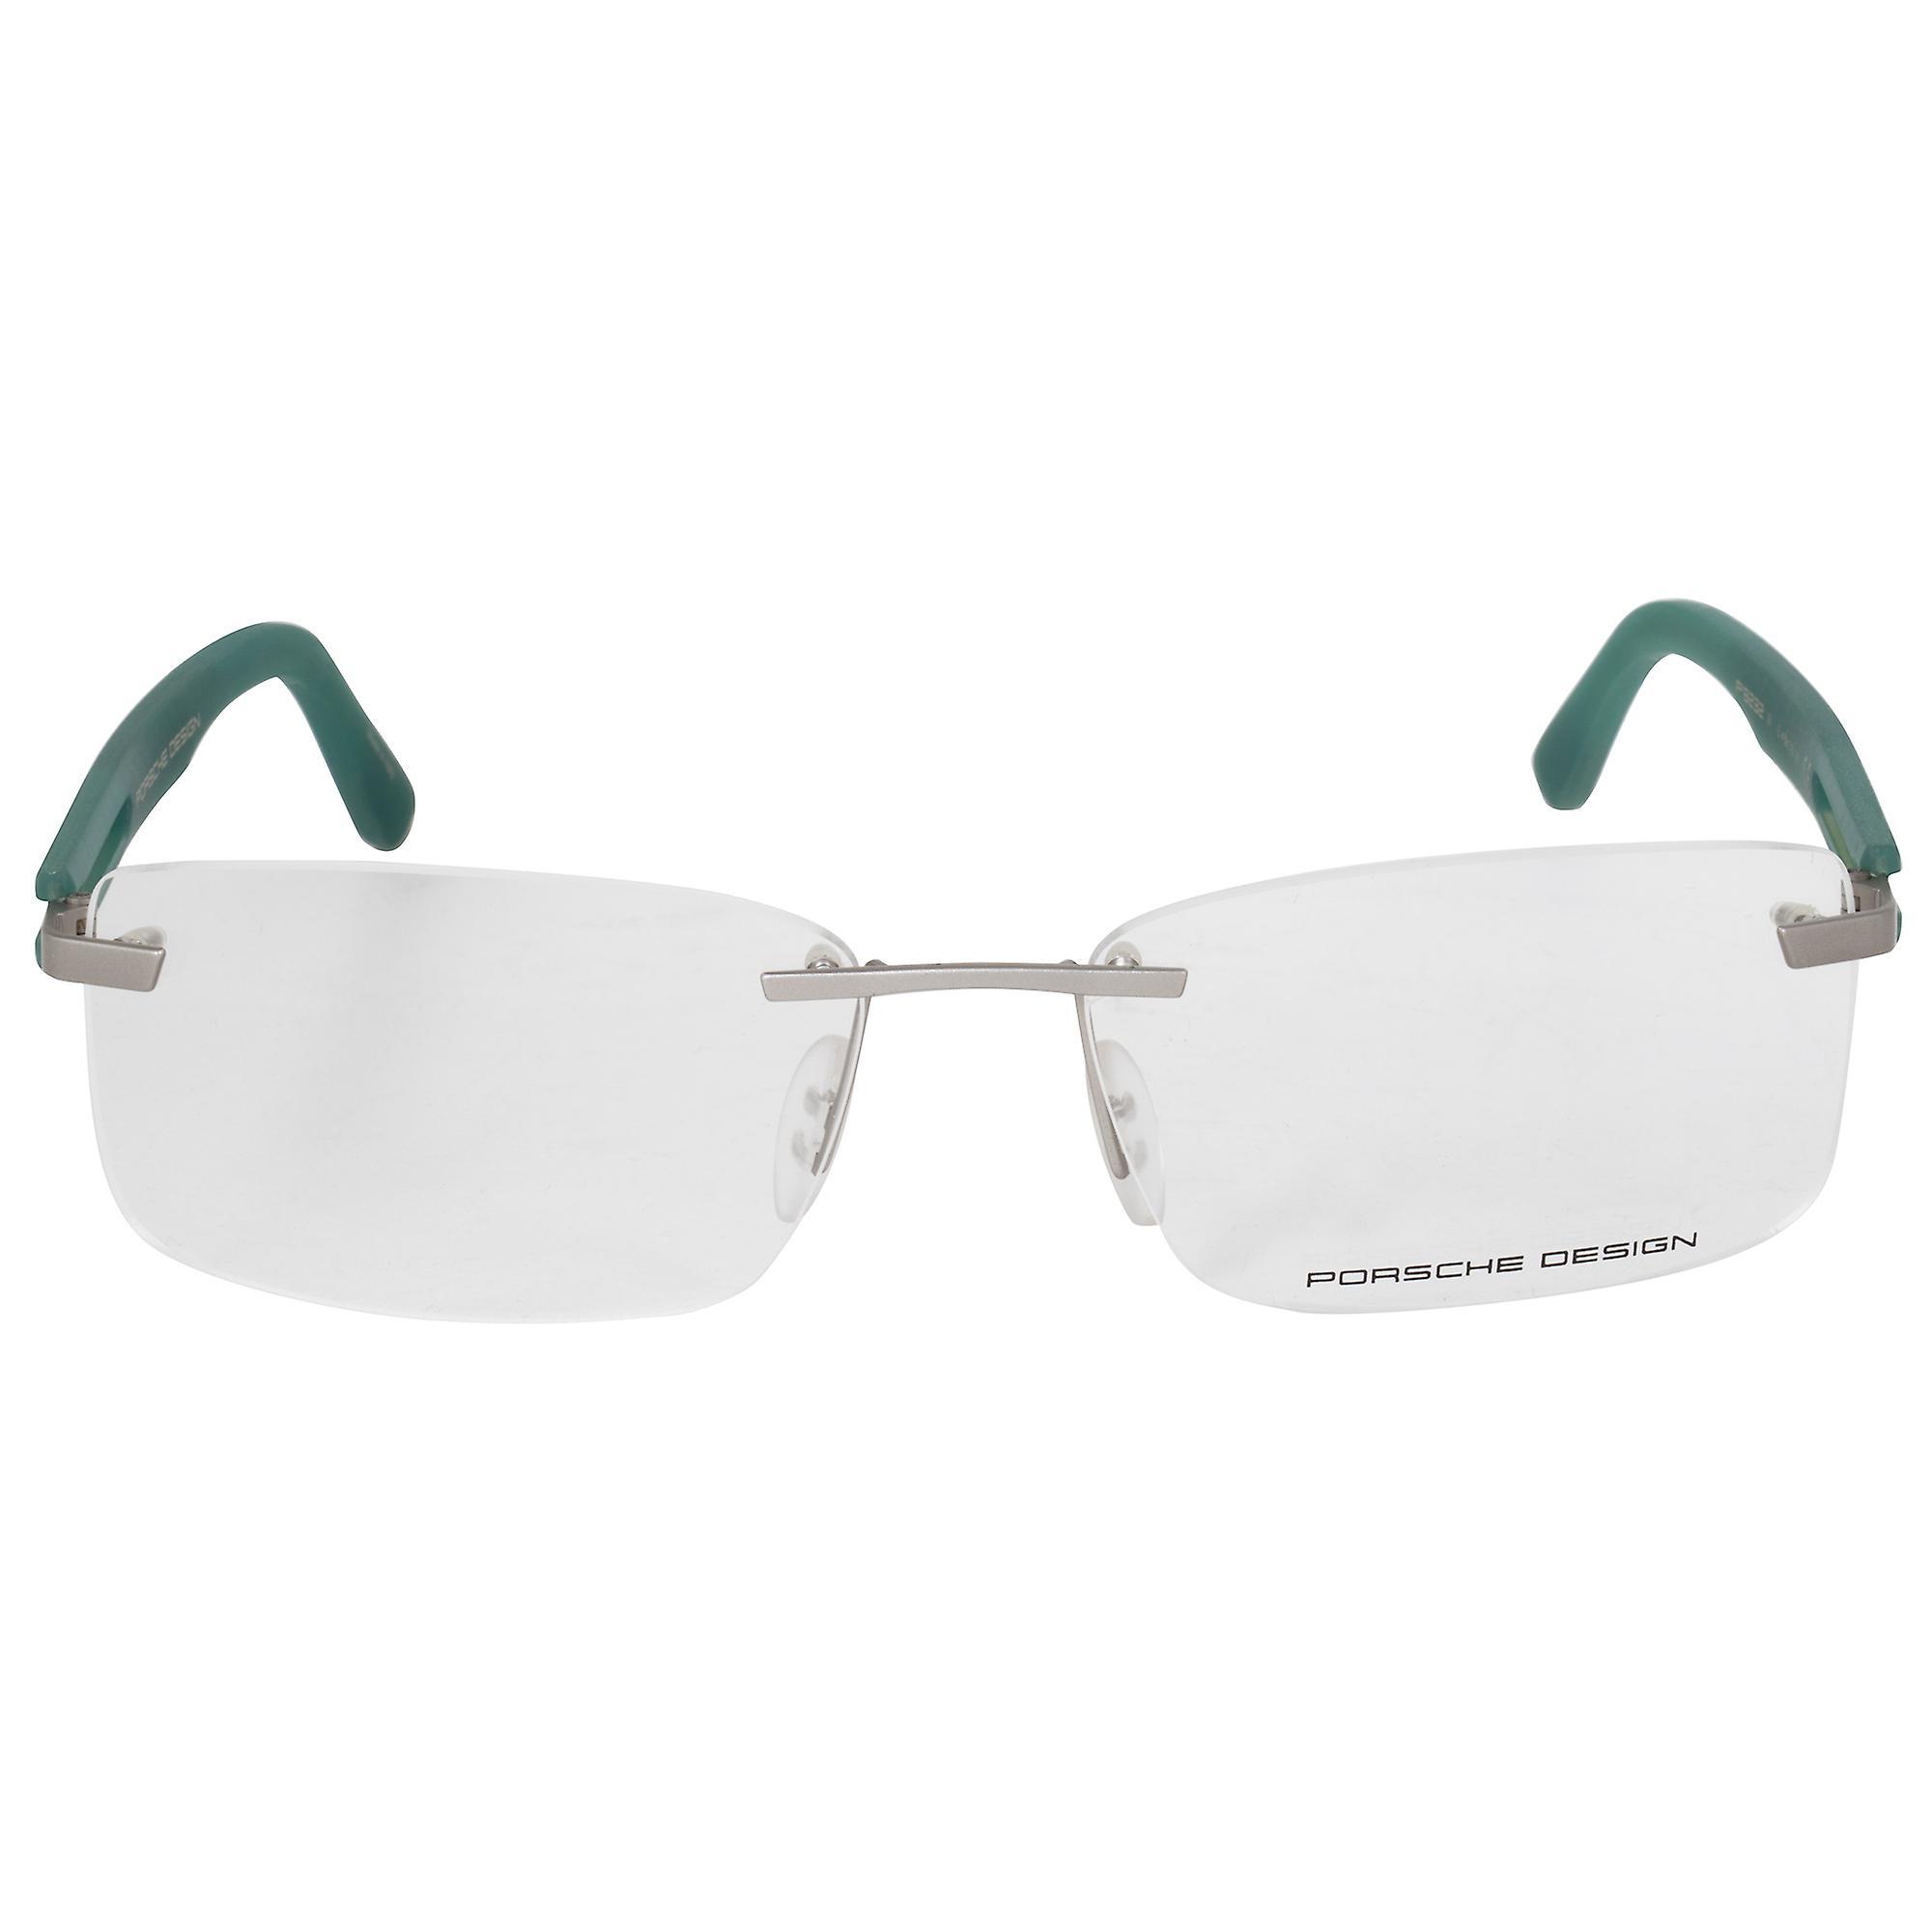 Porsche Design P8232 E Rectangular | Matte Silver Green| Eyeglass Frames